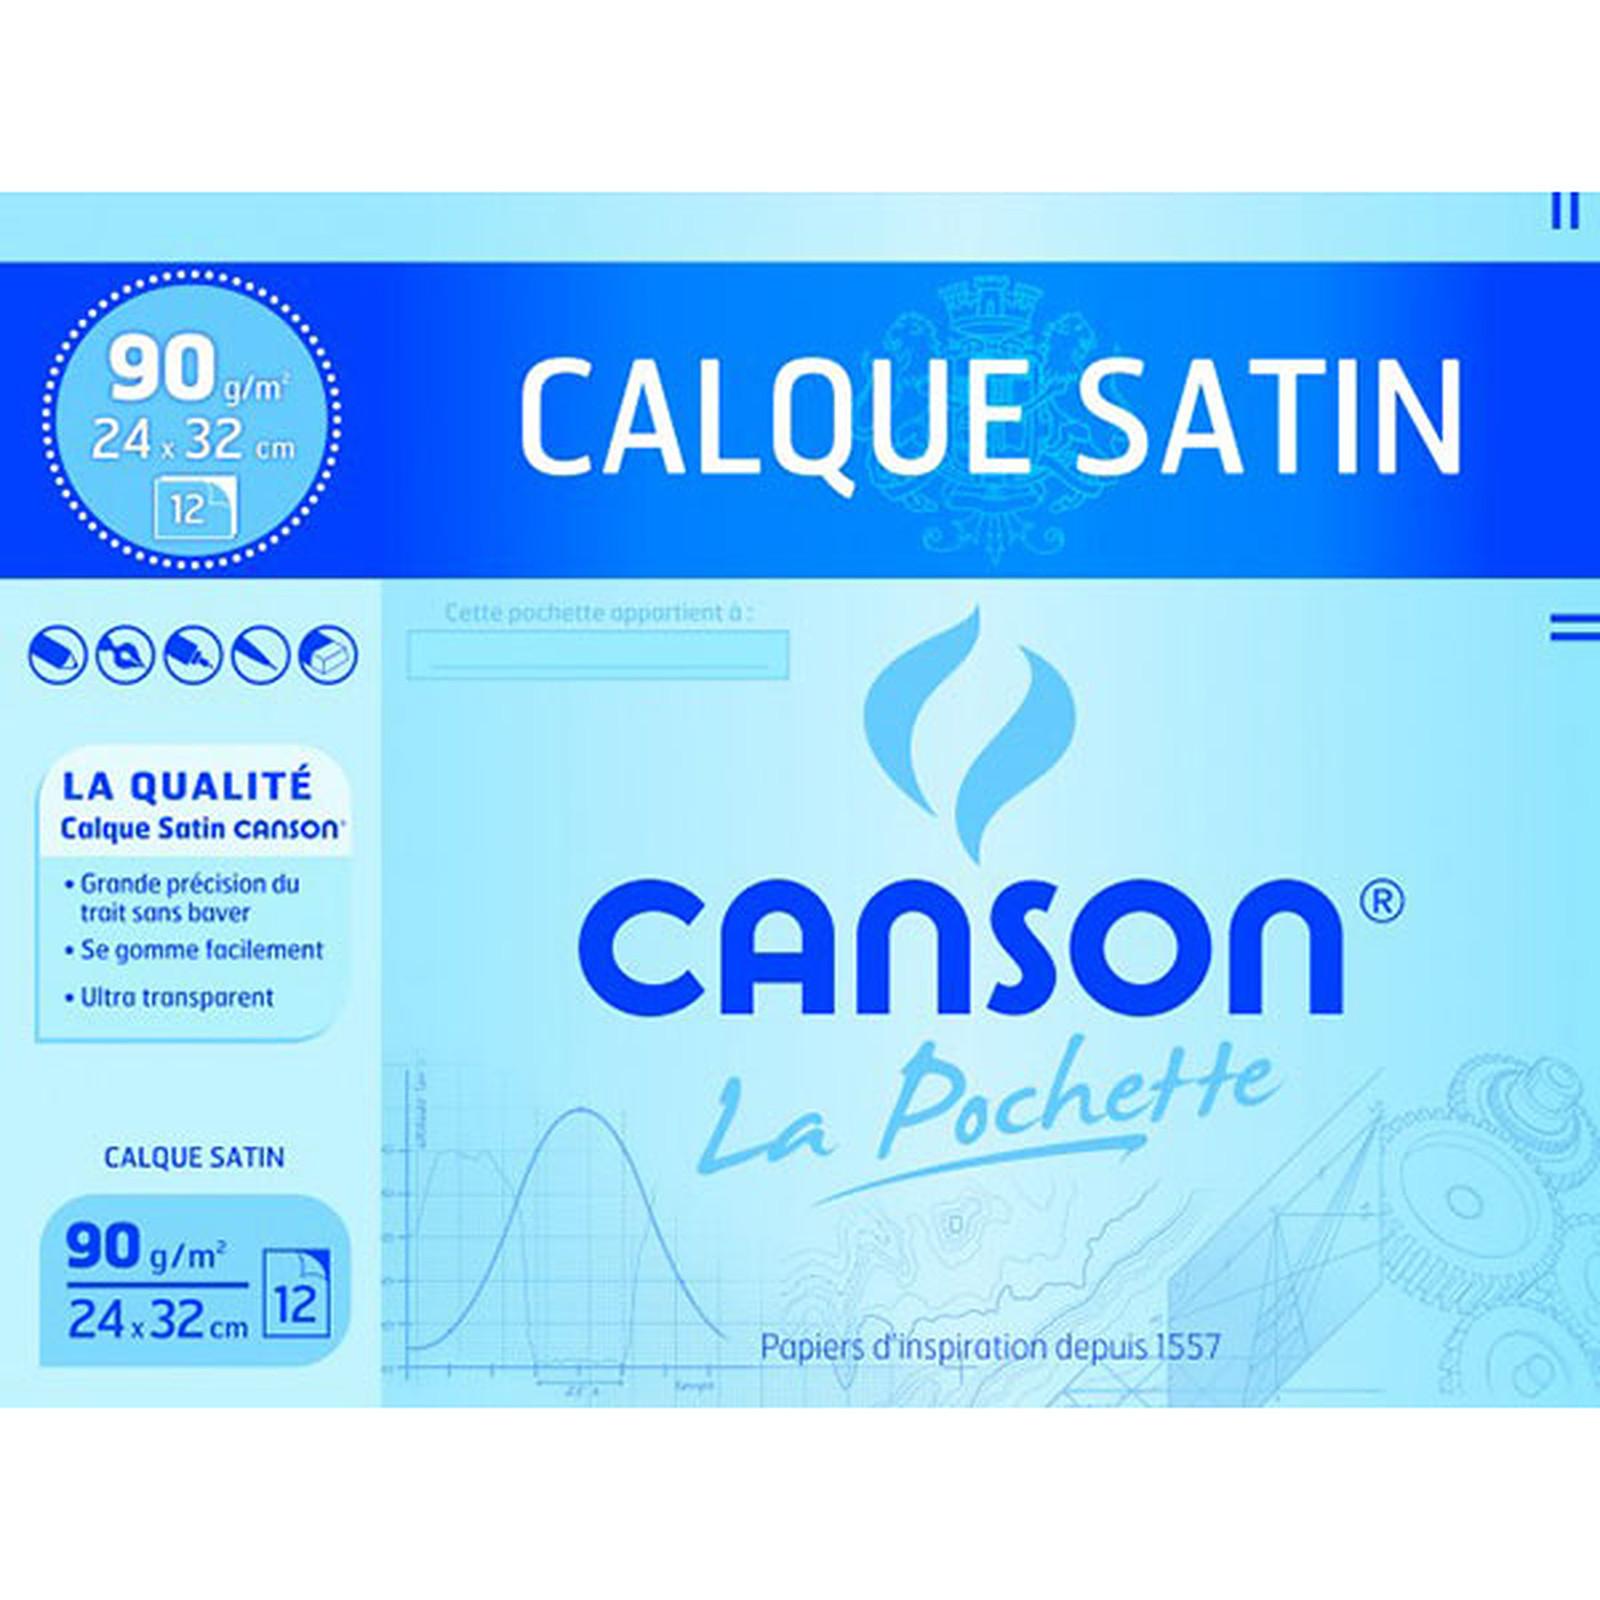 Canson Pochette calque satin 90g 24x32